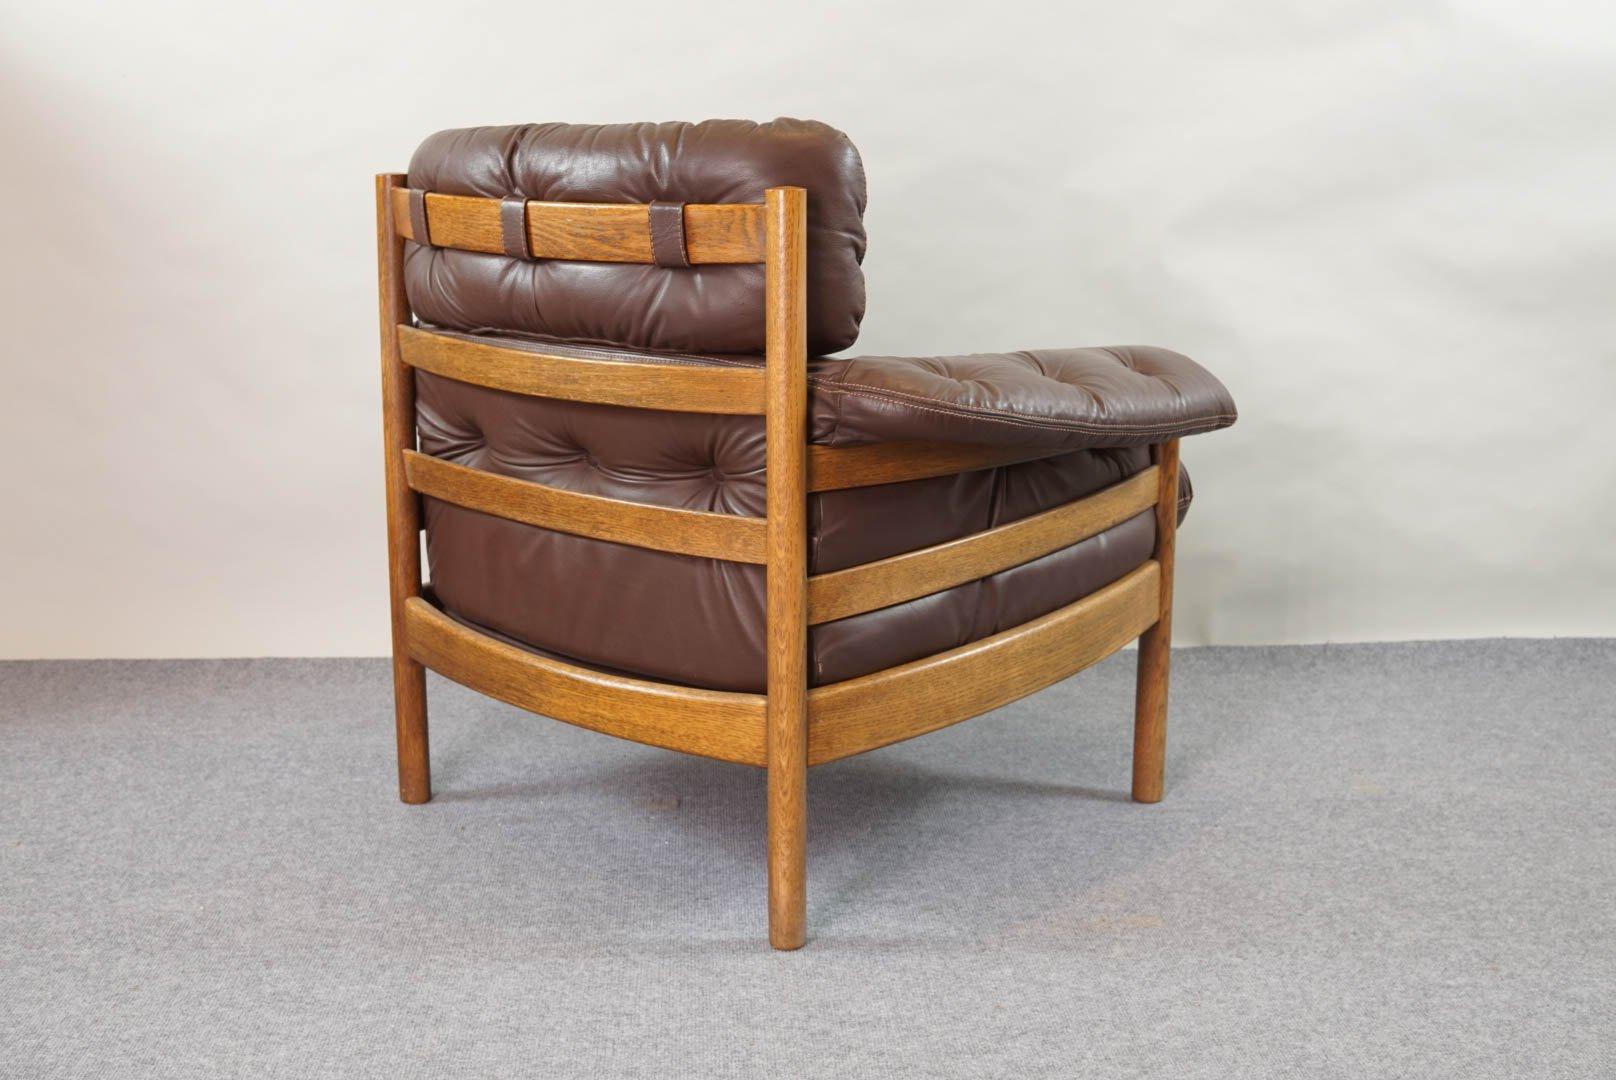 Sessel aus leder und teak von arne norell f r coja 1960er for Sessel aus leder